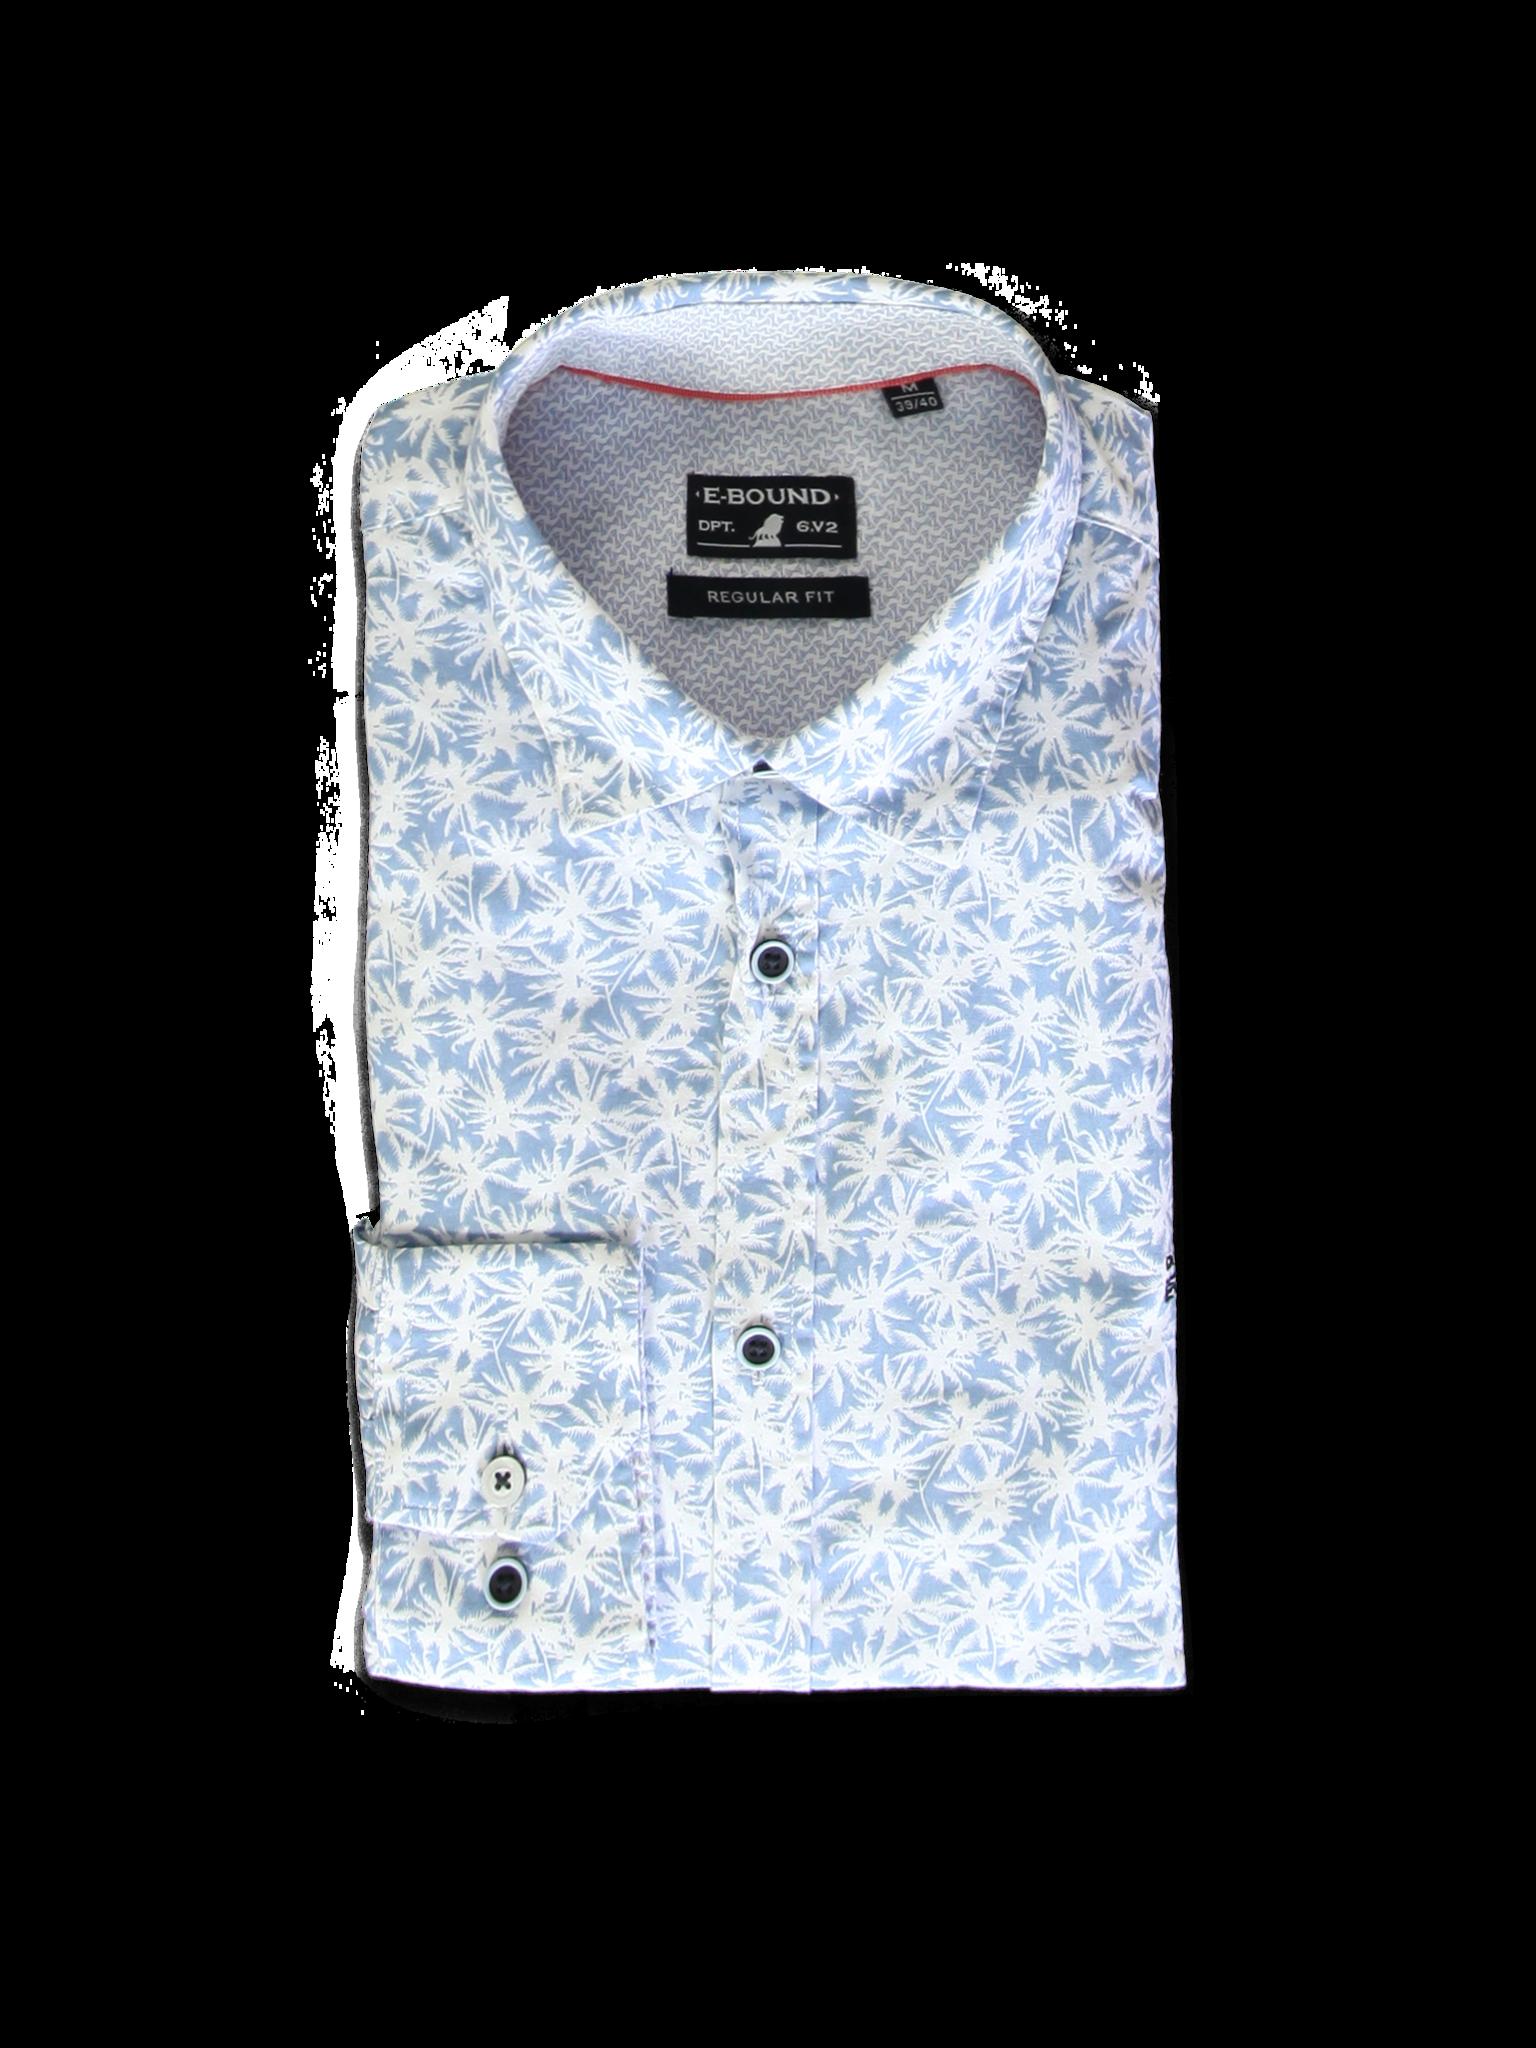 All Brands | Summerproducts Men | Shirt | 15 pcs/box